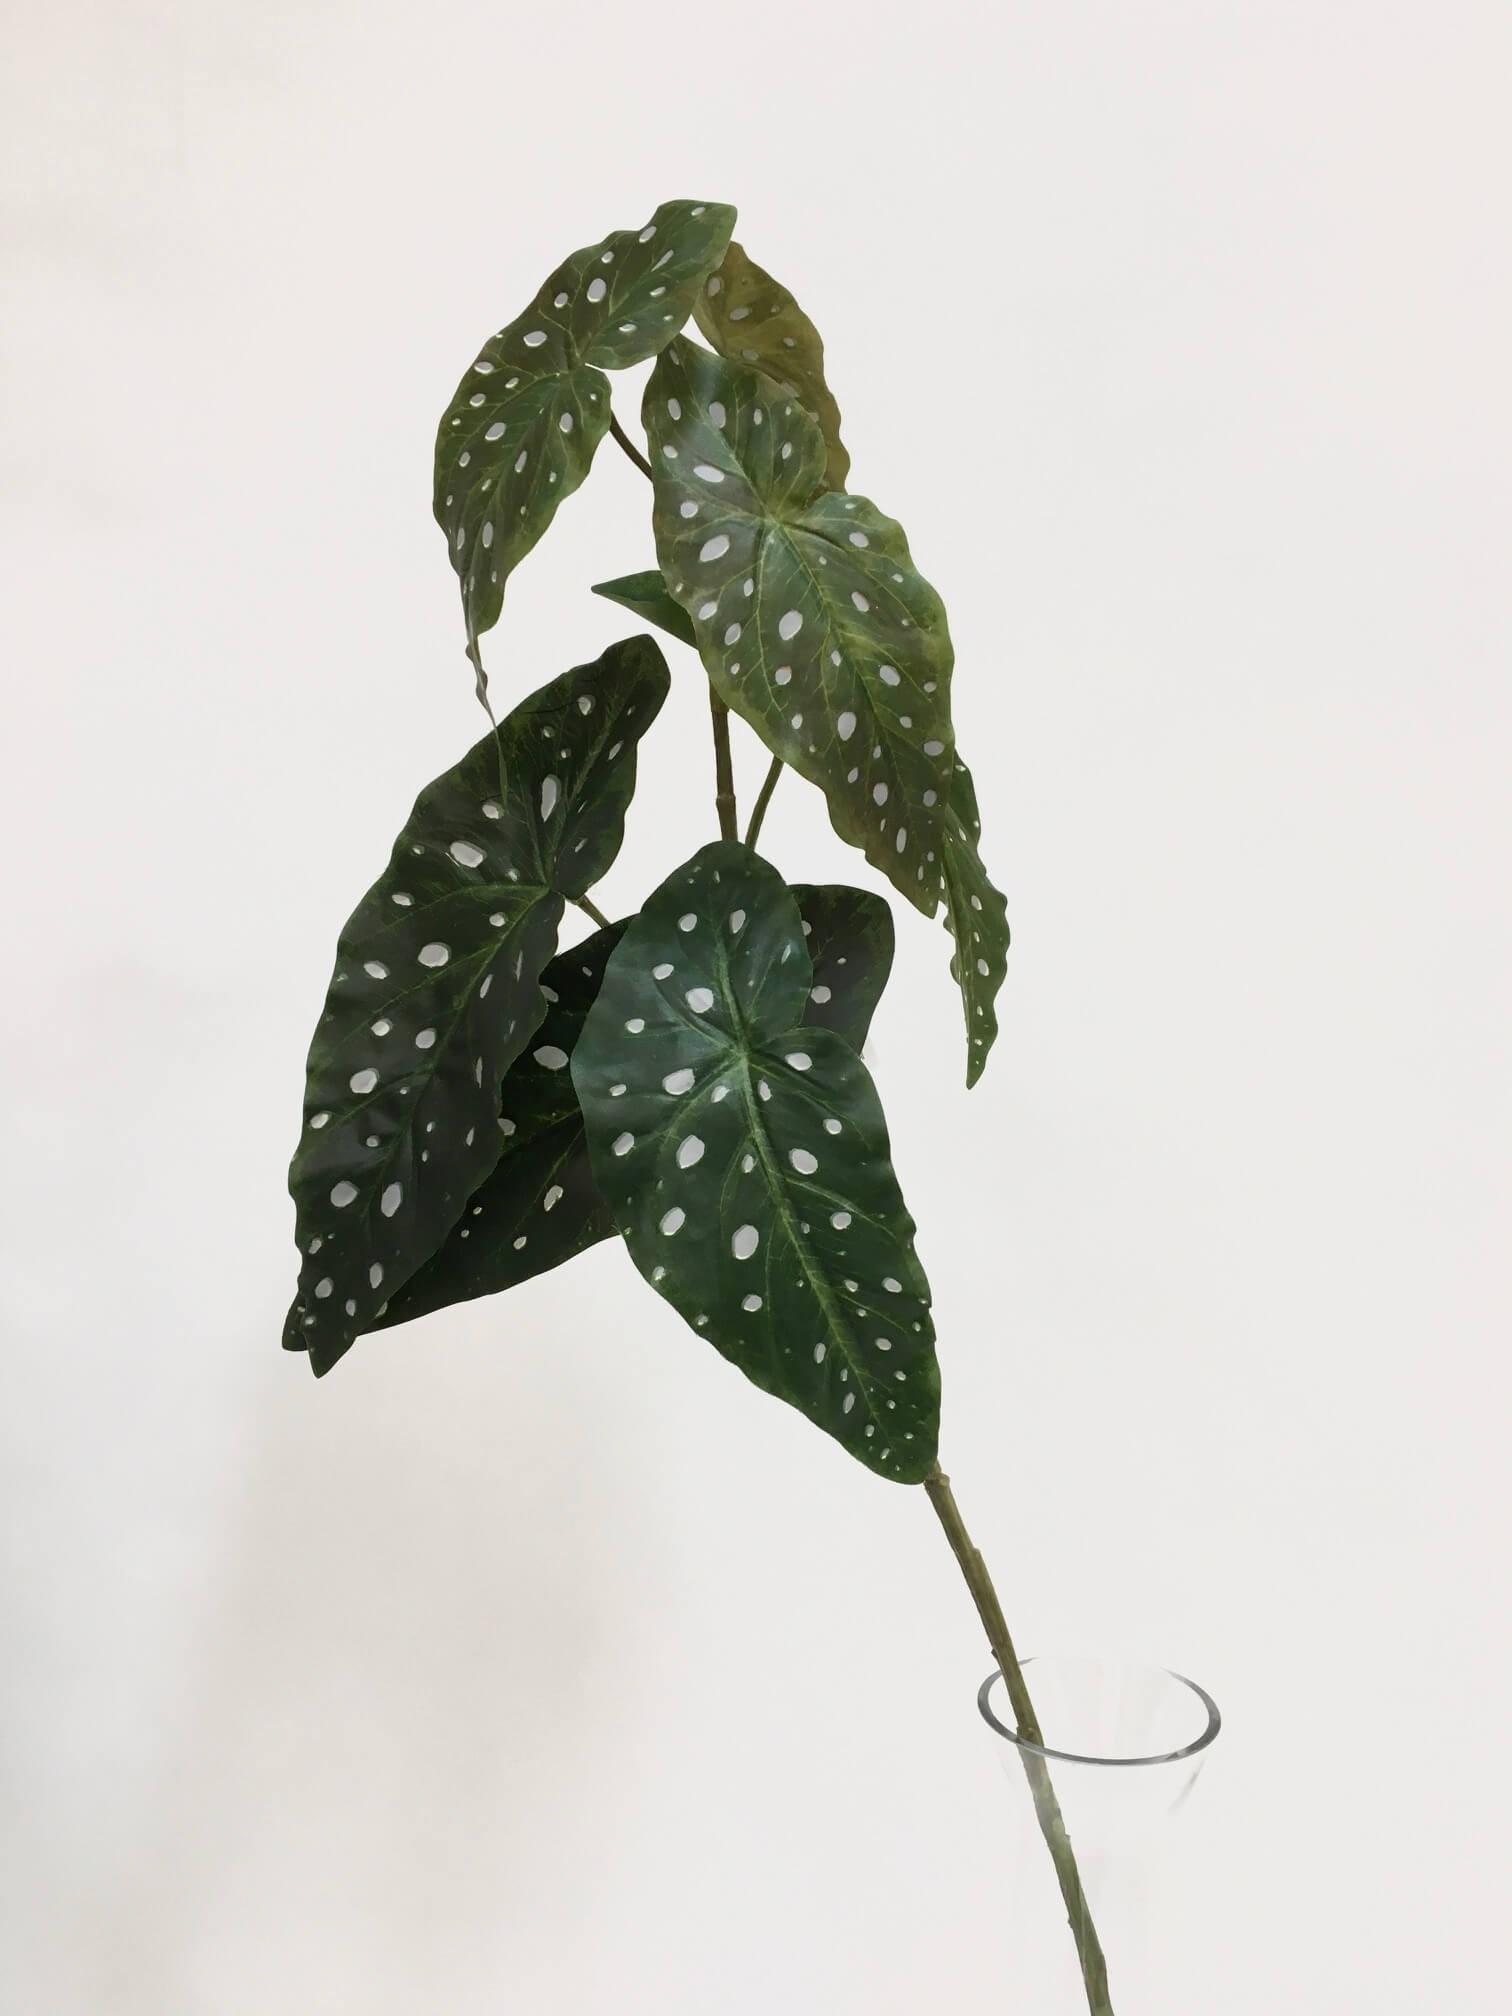 Begonia, konstgjord kvist, forell